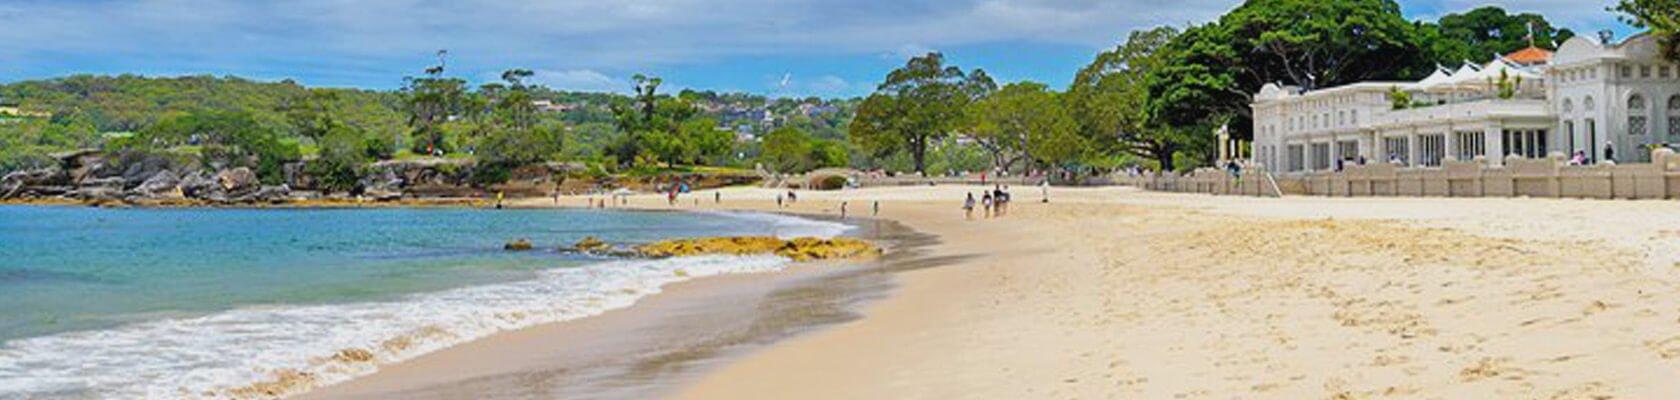 Popular Beach in Sydney